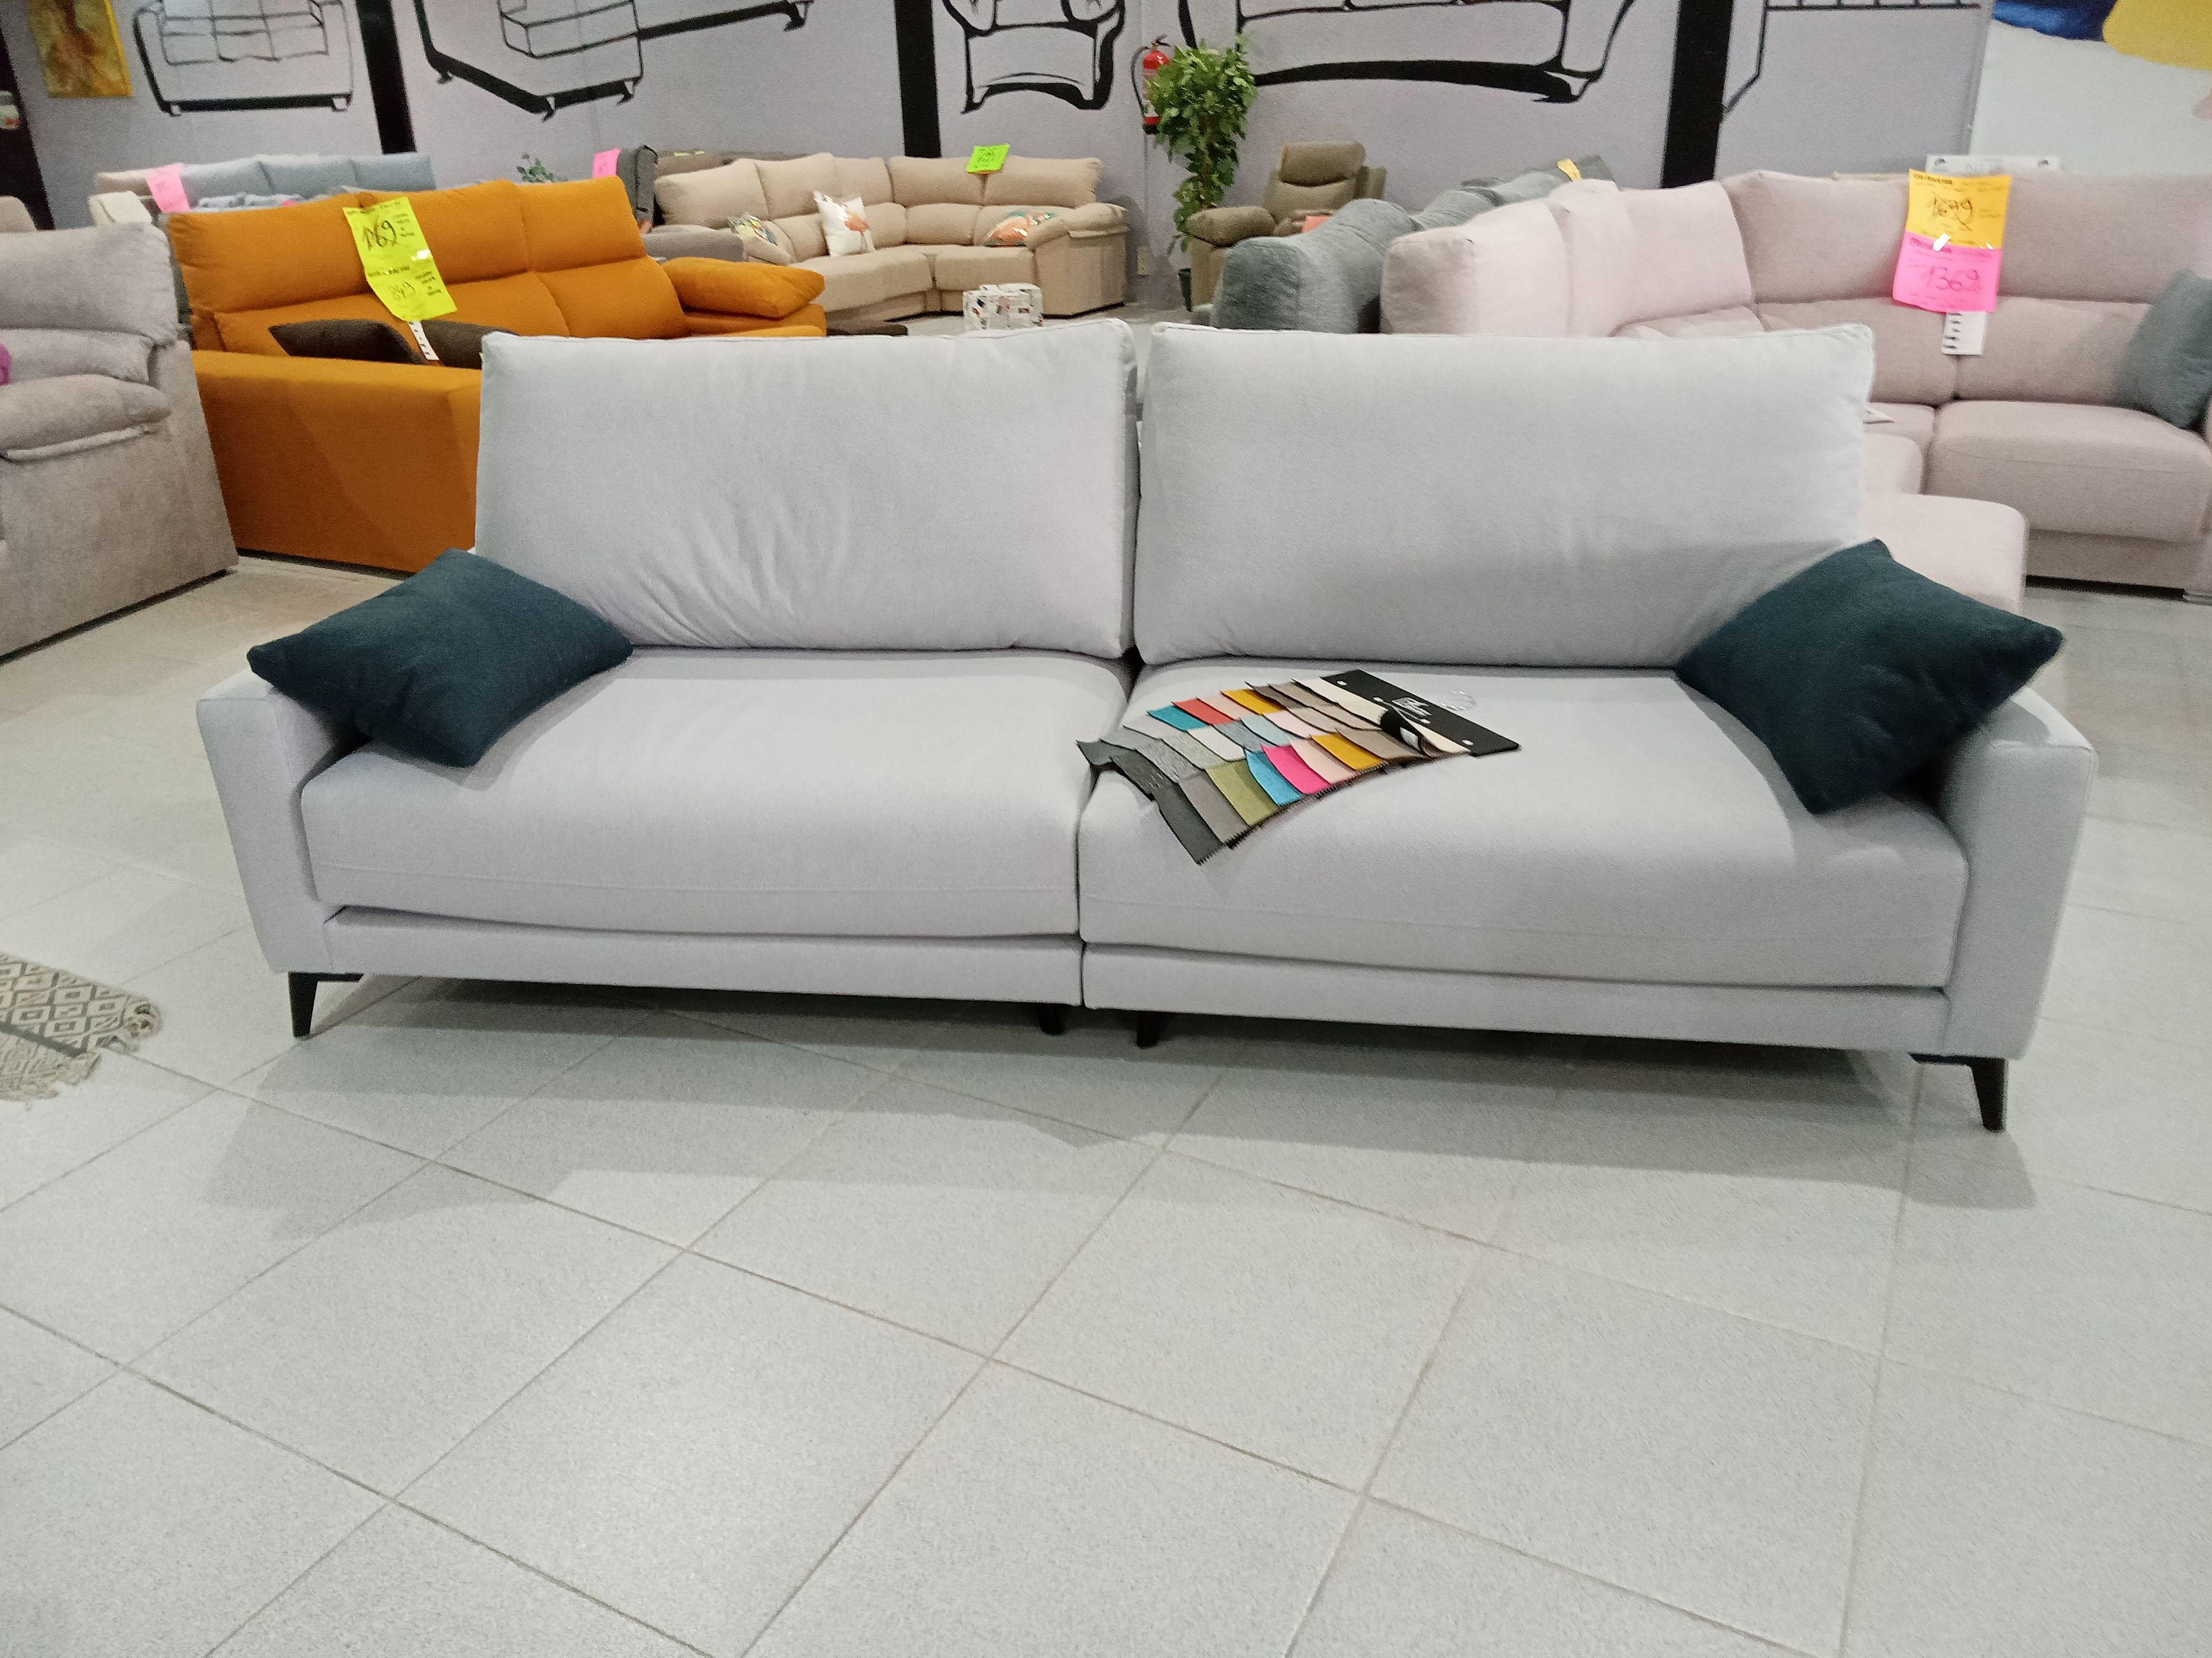 Foto 3 de Colchones, sofás y canapés en    PS Sofás